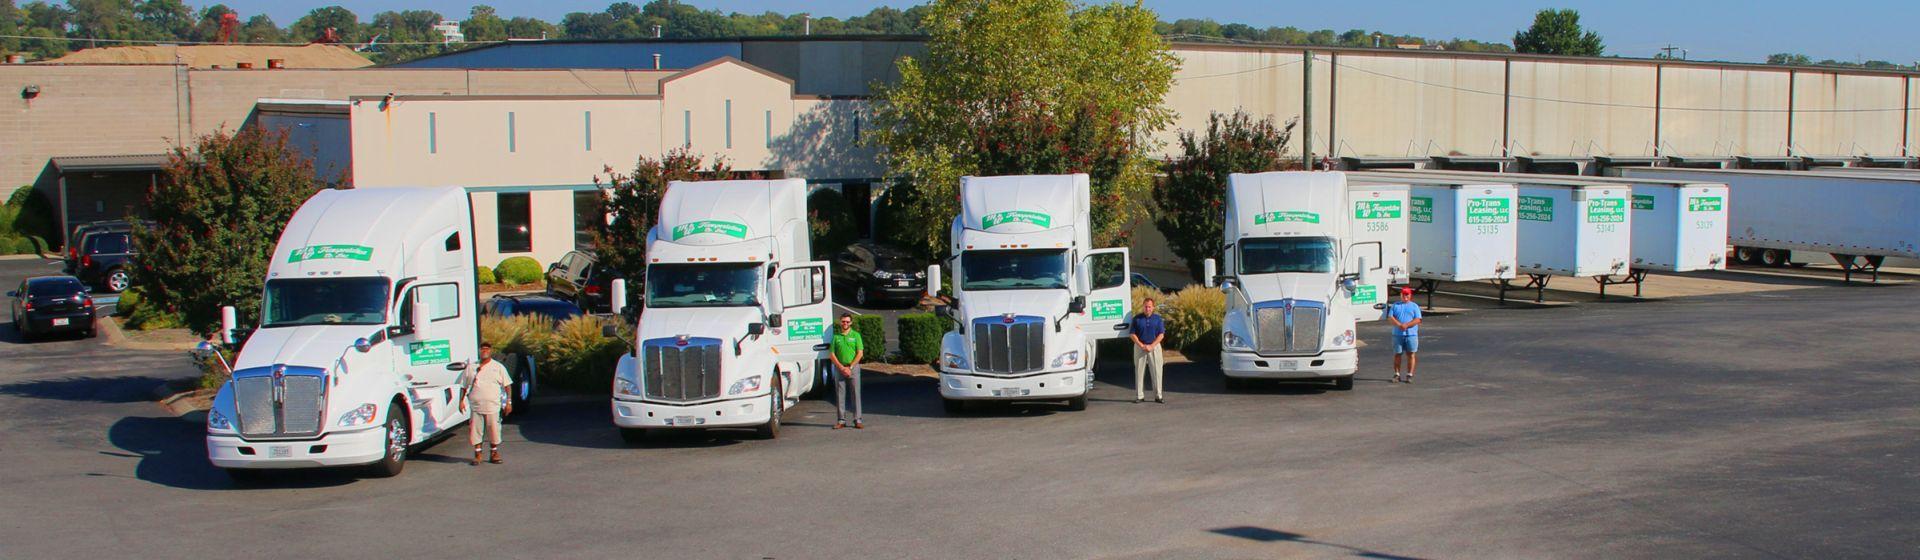 Looking for a top Transportation job in Nashville? Apply